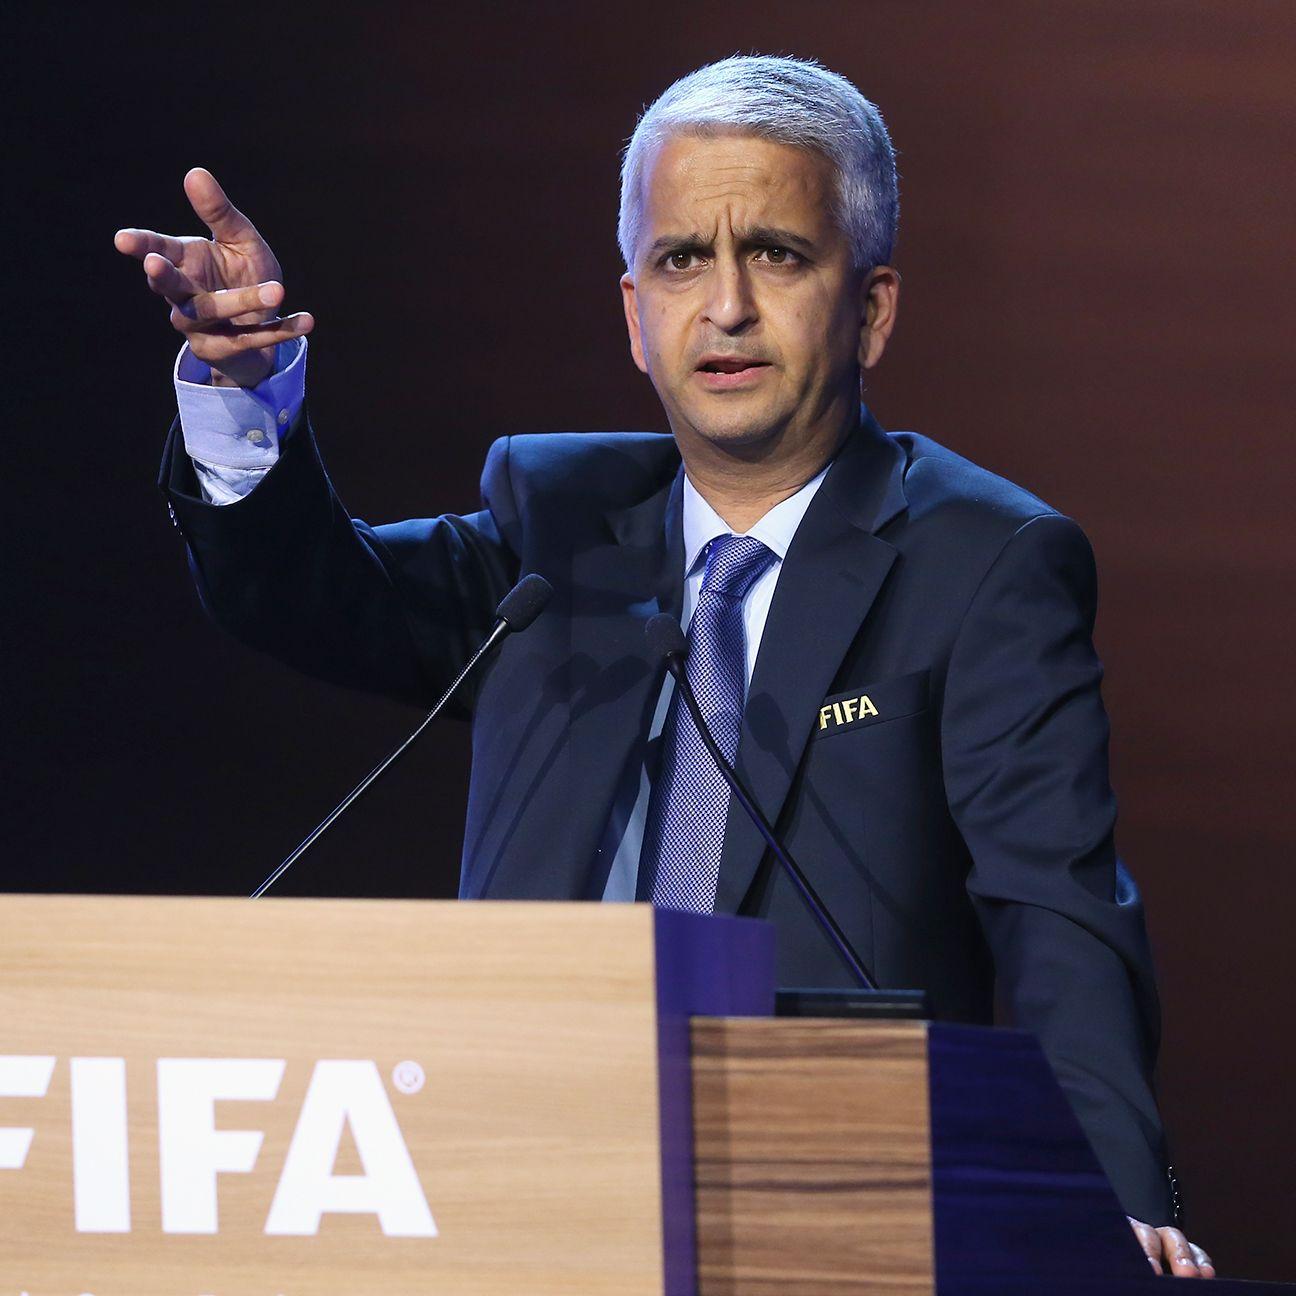 Sunil Gulati will no longer serve as U.S. Soccer Federation president when his term ends next year.